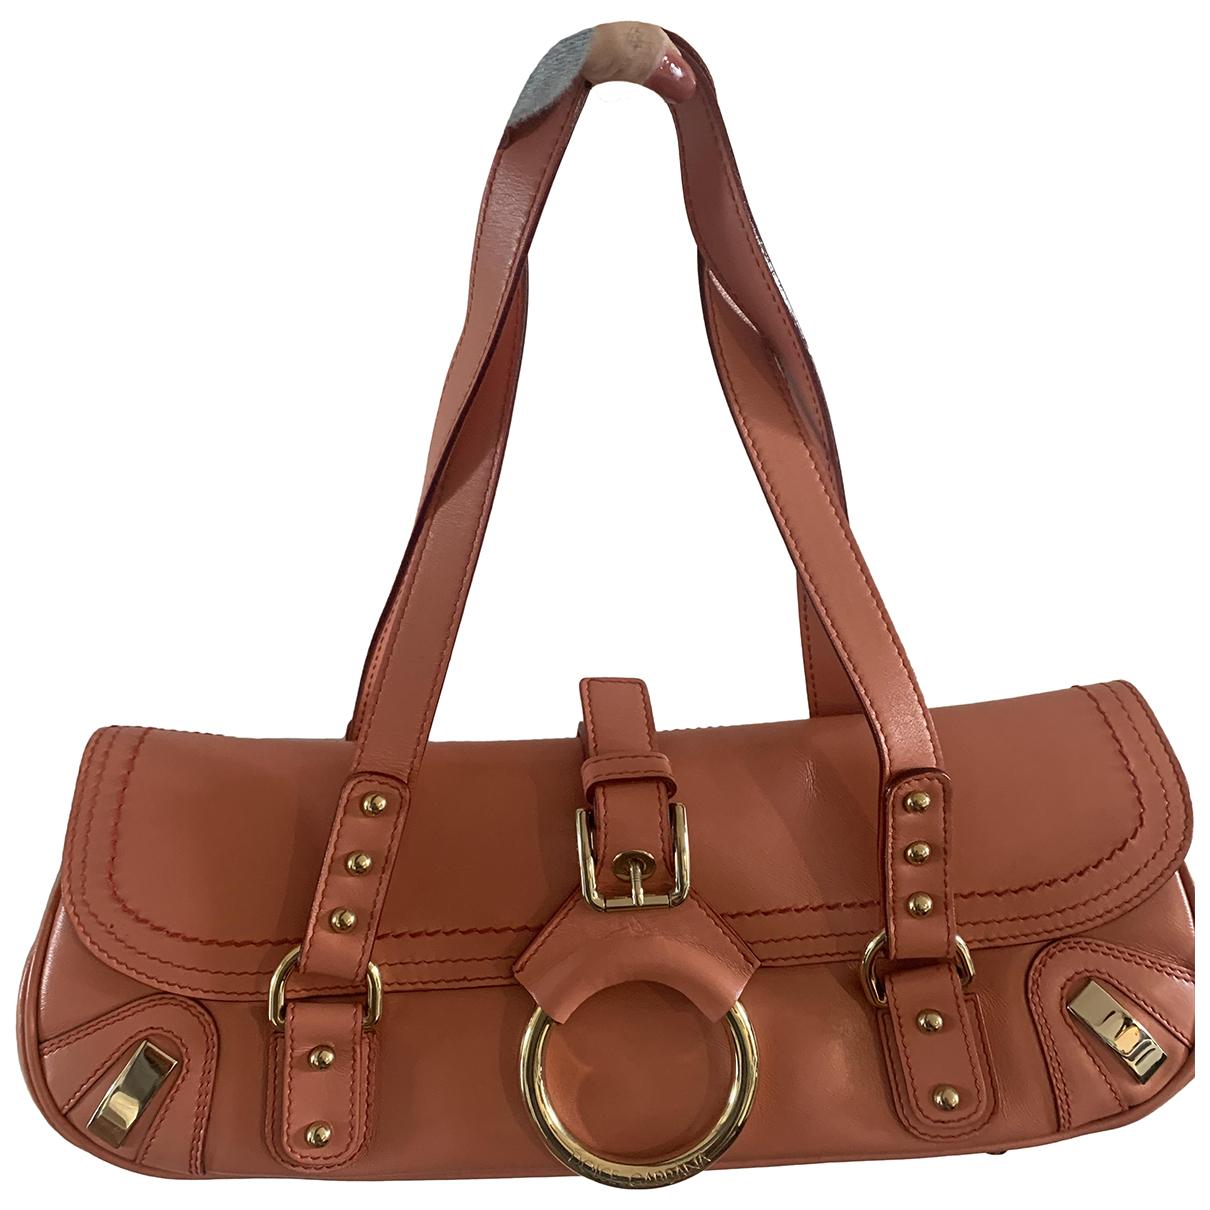 Dolce & Gabbana N Pink Leather handbag for Women N